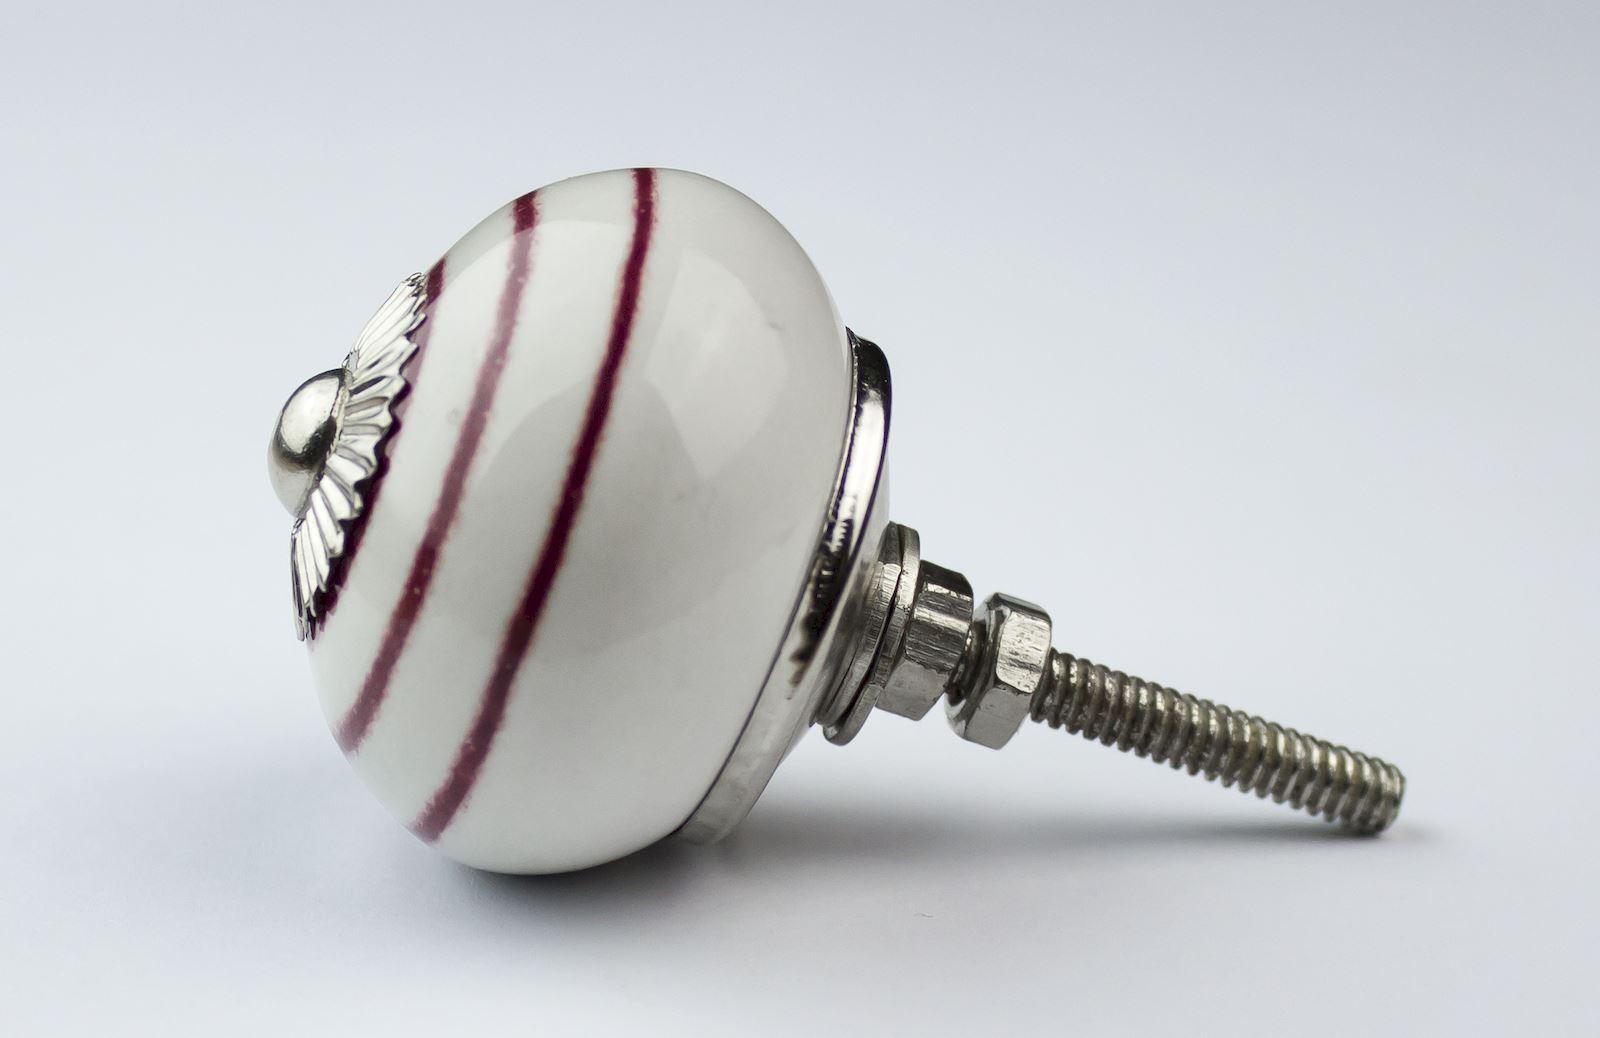 Dots-amp-Stripes-Ceramic-Door-Knobs-Handles-Furniture-Drawer-Pulls-Cupboard miniatura 51